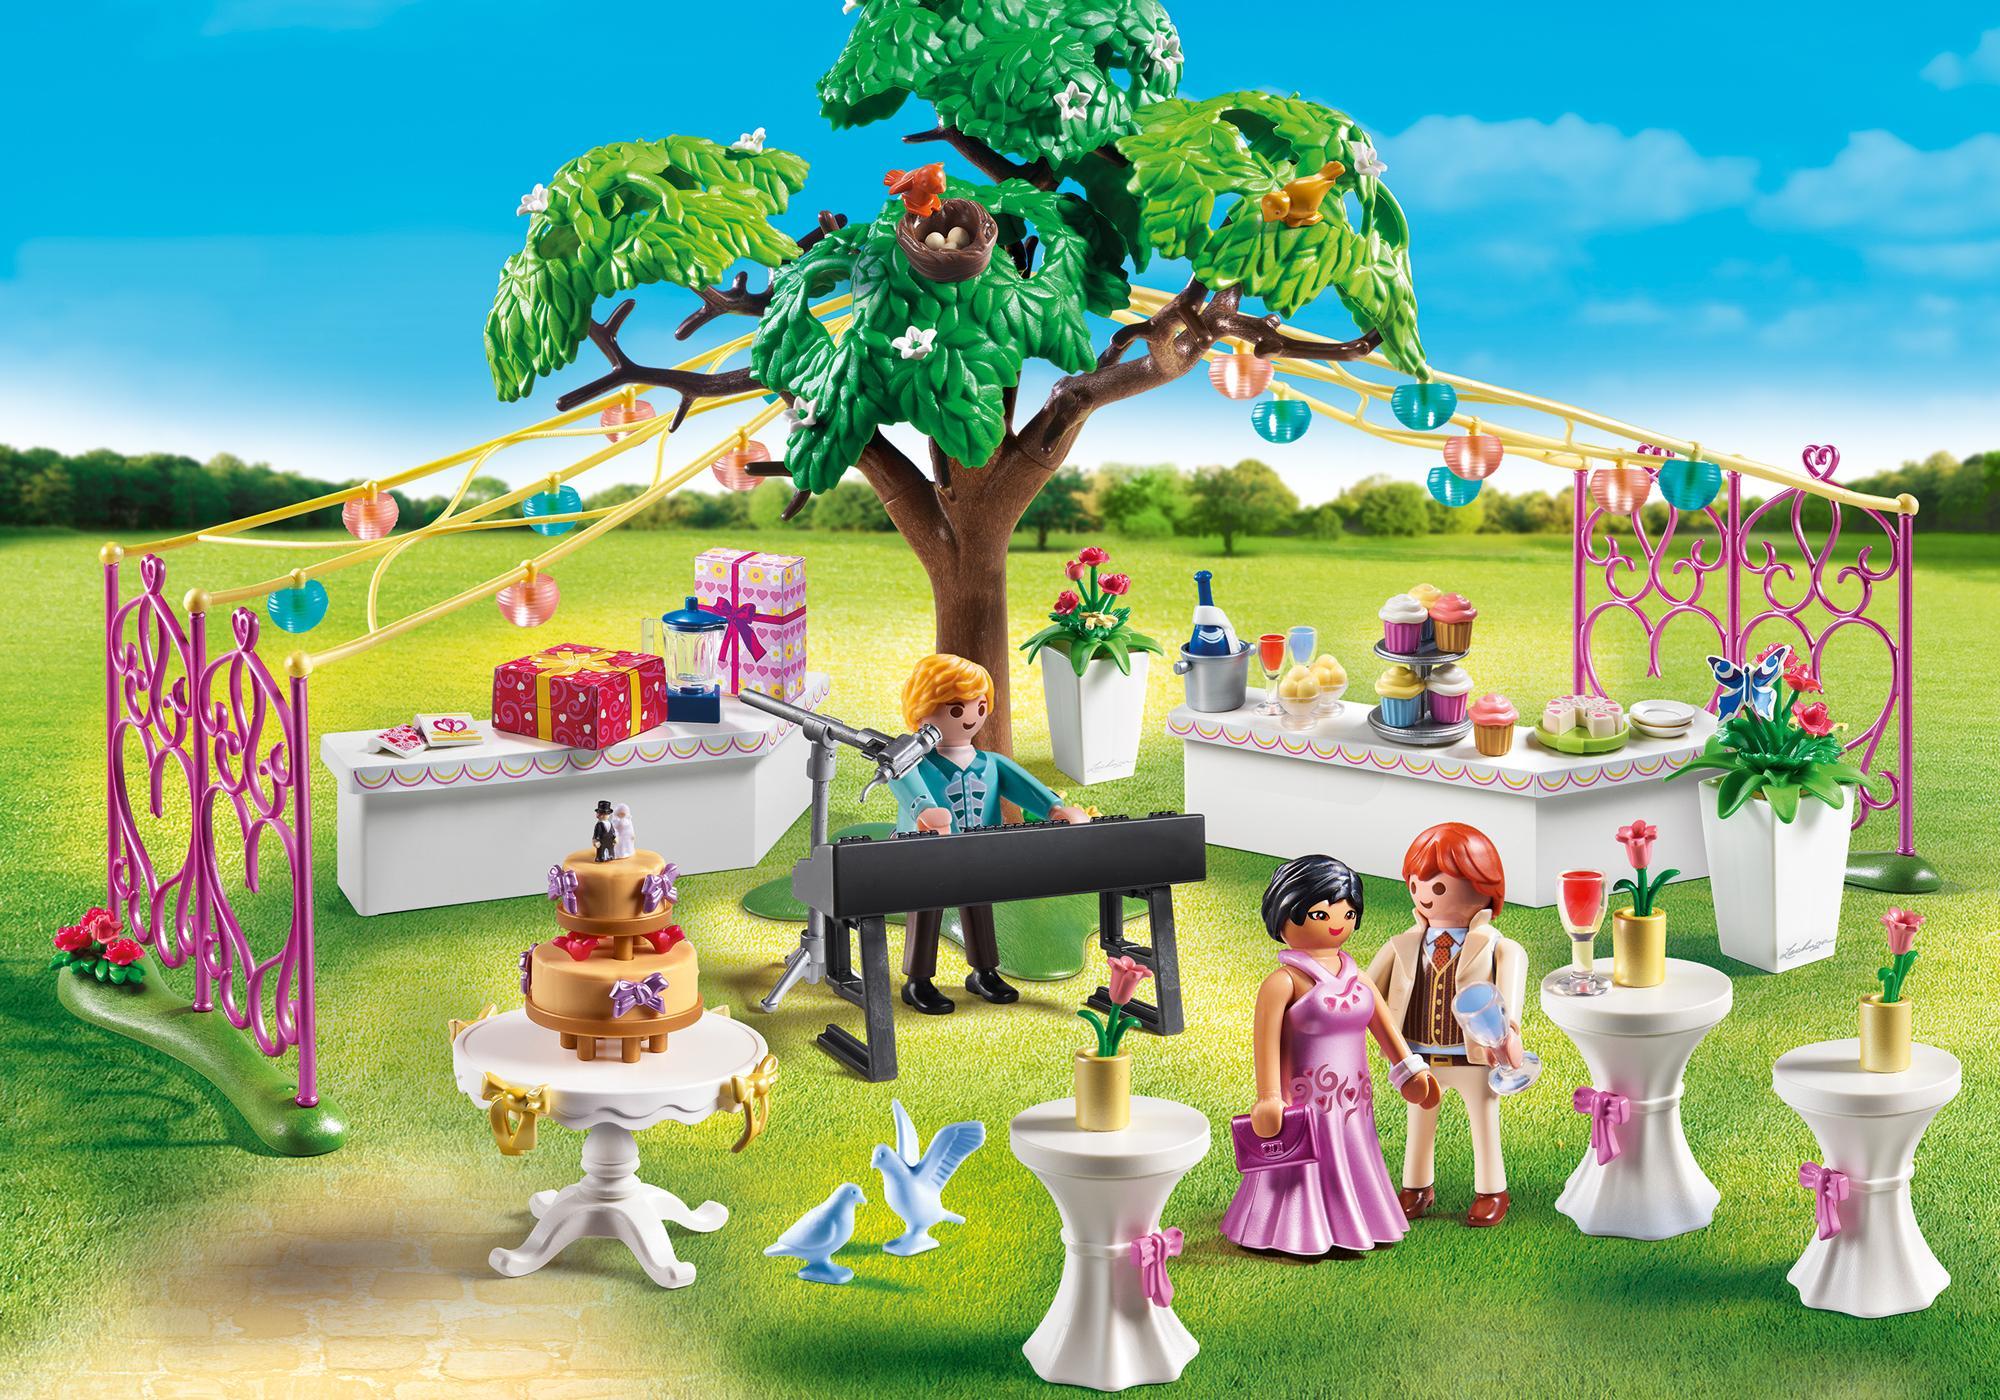 Wedding Reception 9228 Playmobil 174 Northern Europe